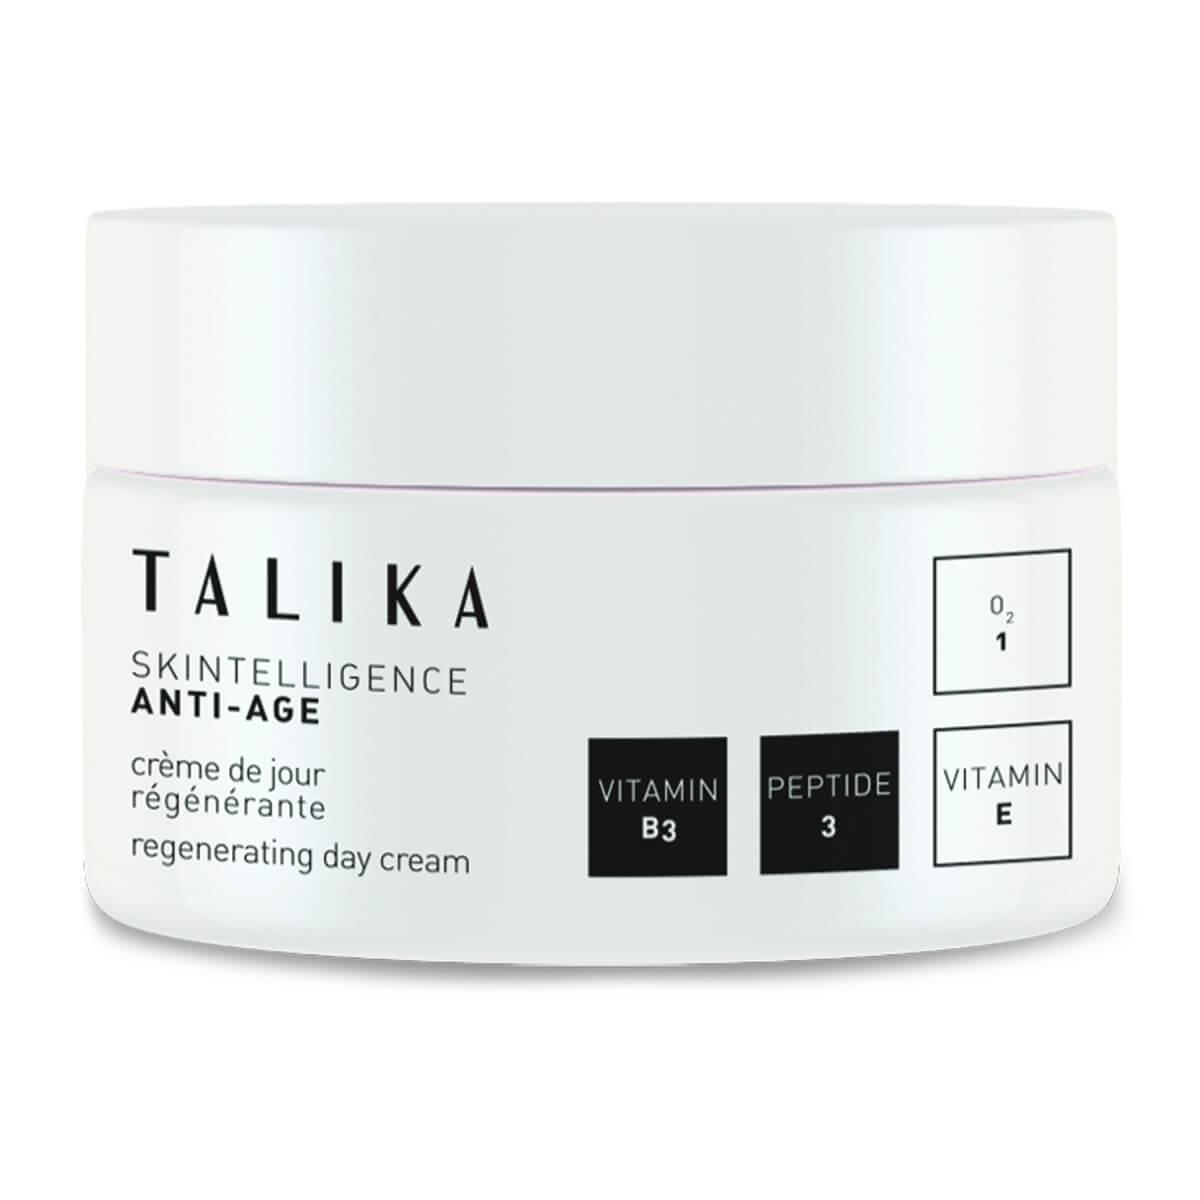 Cream Talika Skintelligence Anti-Age Regnerating Day 50ml 50ml